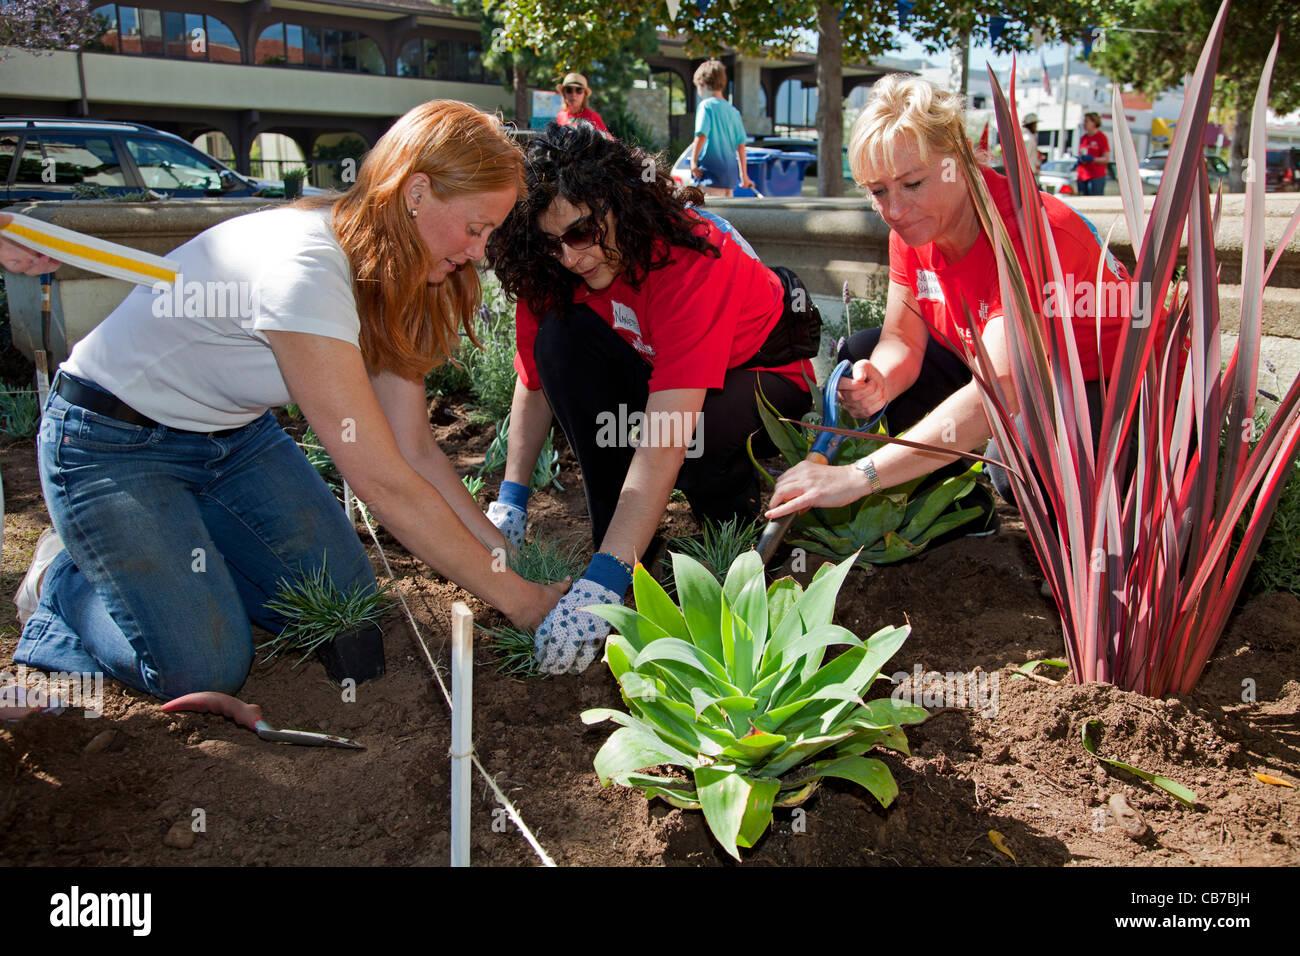 Keller Williams volunteers help clean up at Palisades Elementary School in the Pacific Palisades - Stock Image